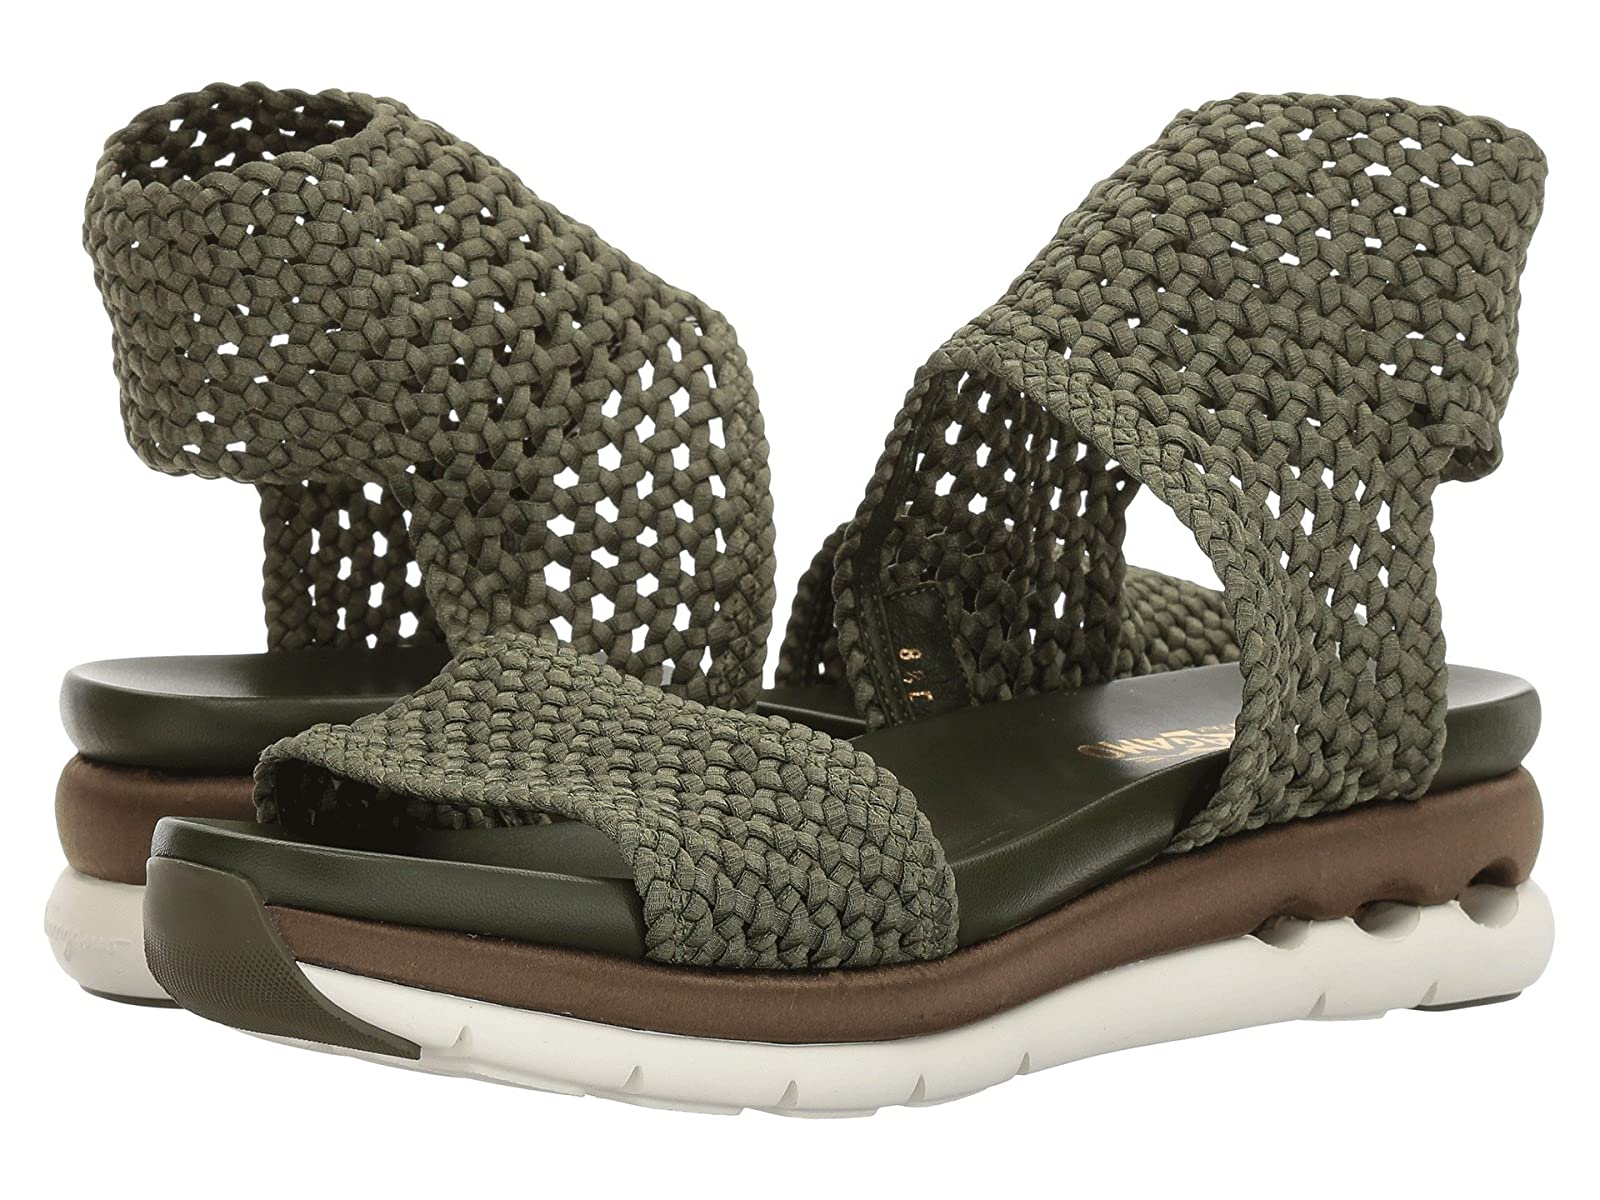 Salvatore Ferragamo Elastic Platform SandalCheap and distinctive eye-catching shoes